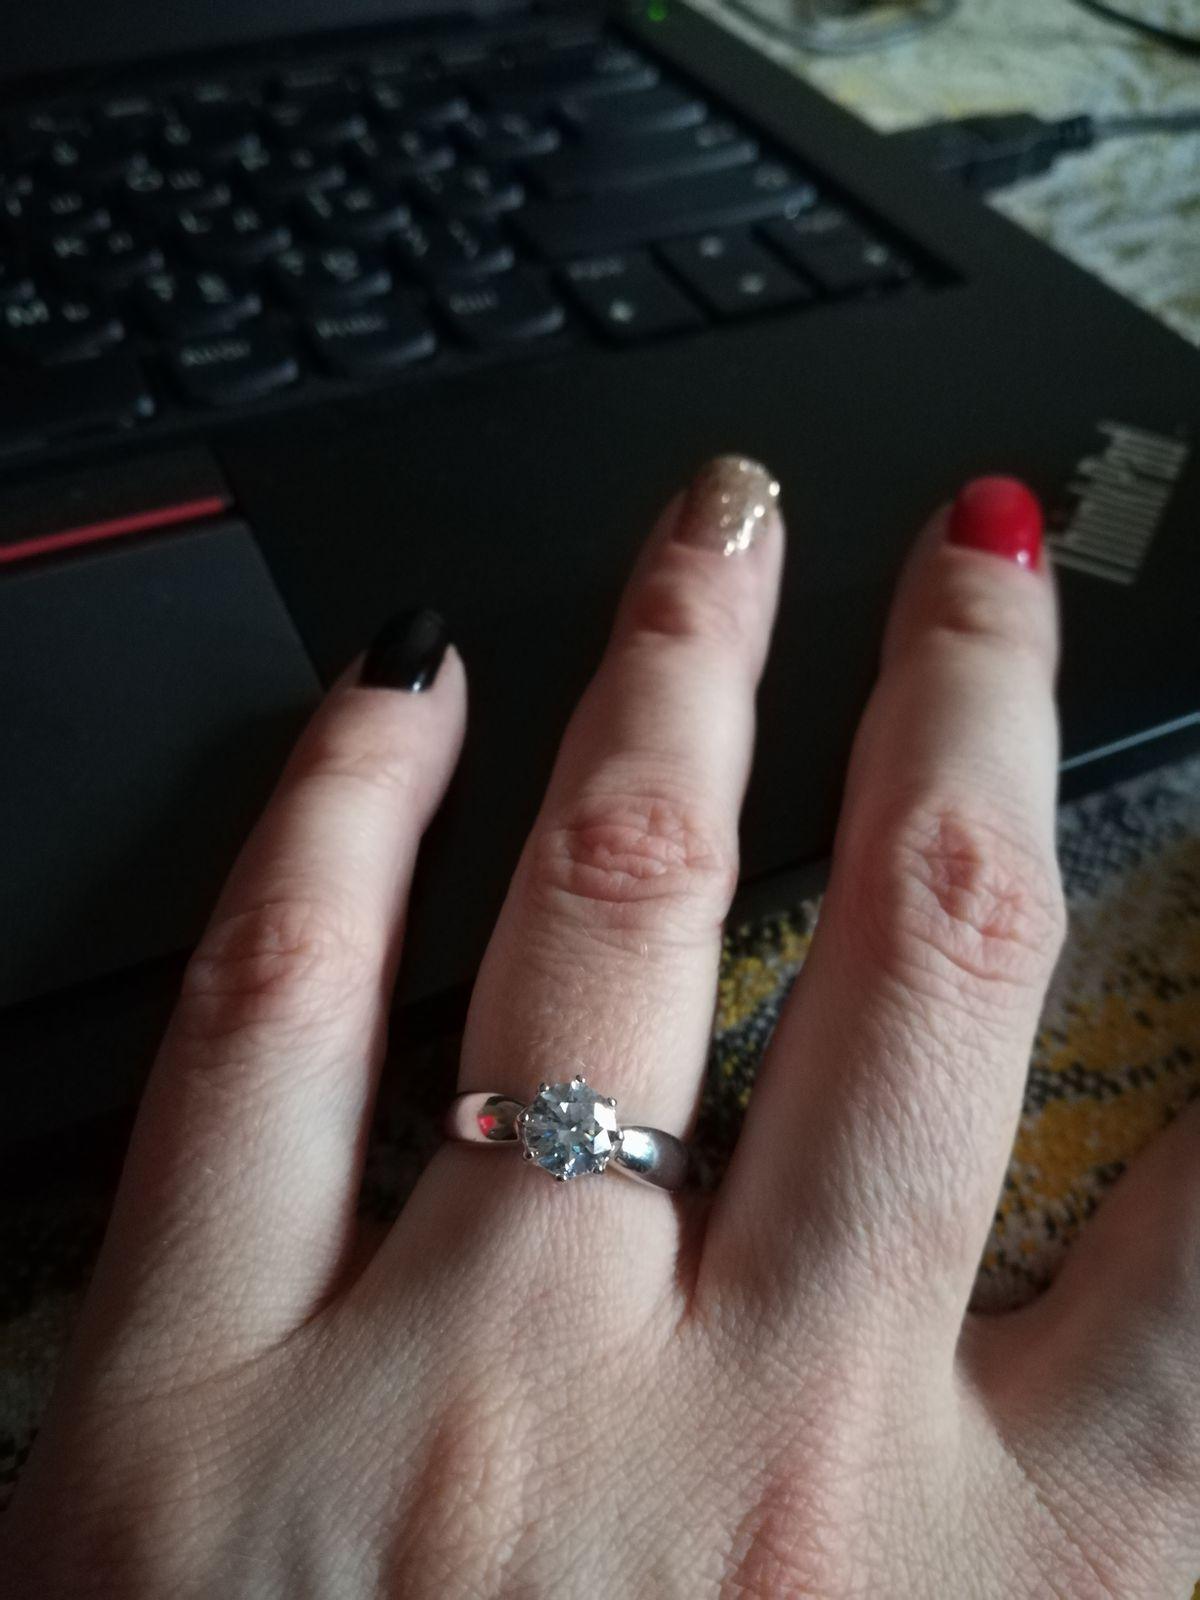 Отличное кольцо за такую цену